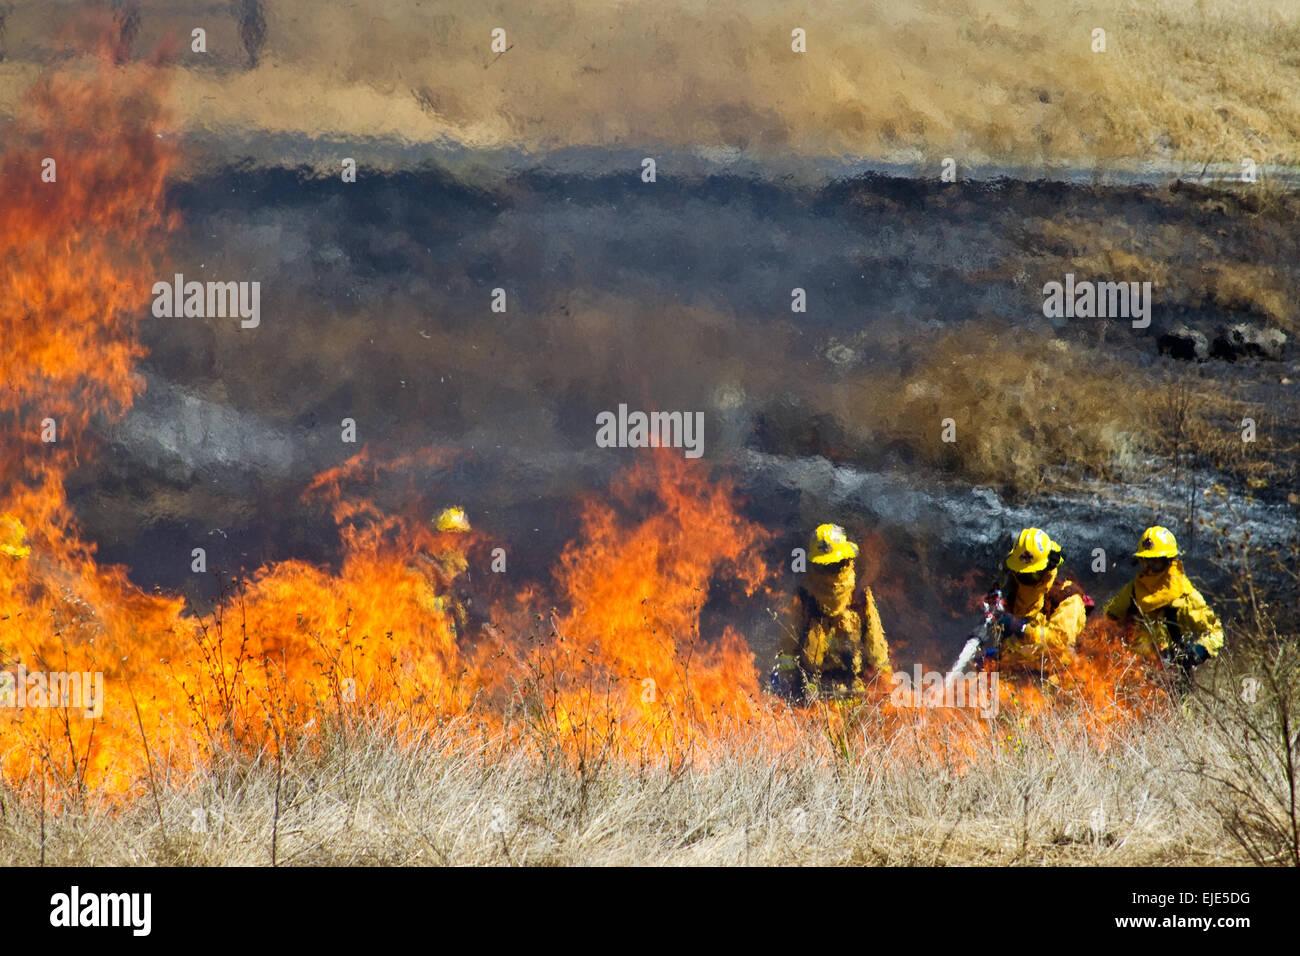 Firefighter Antincendio Immagini Stock